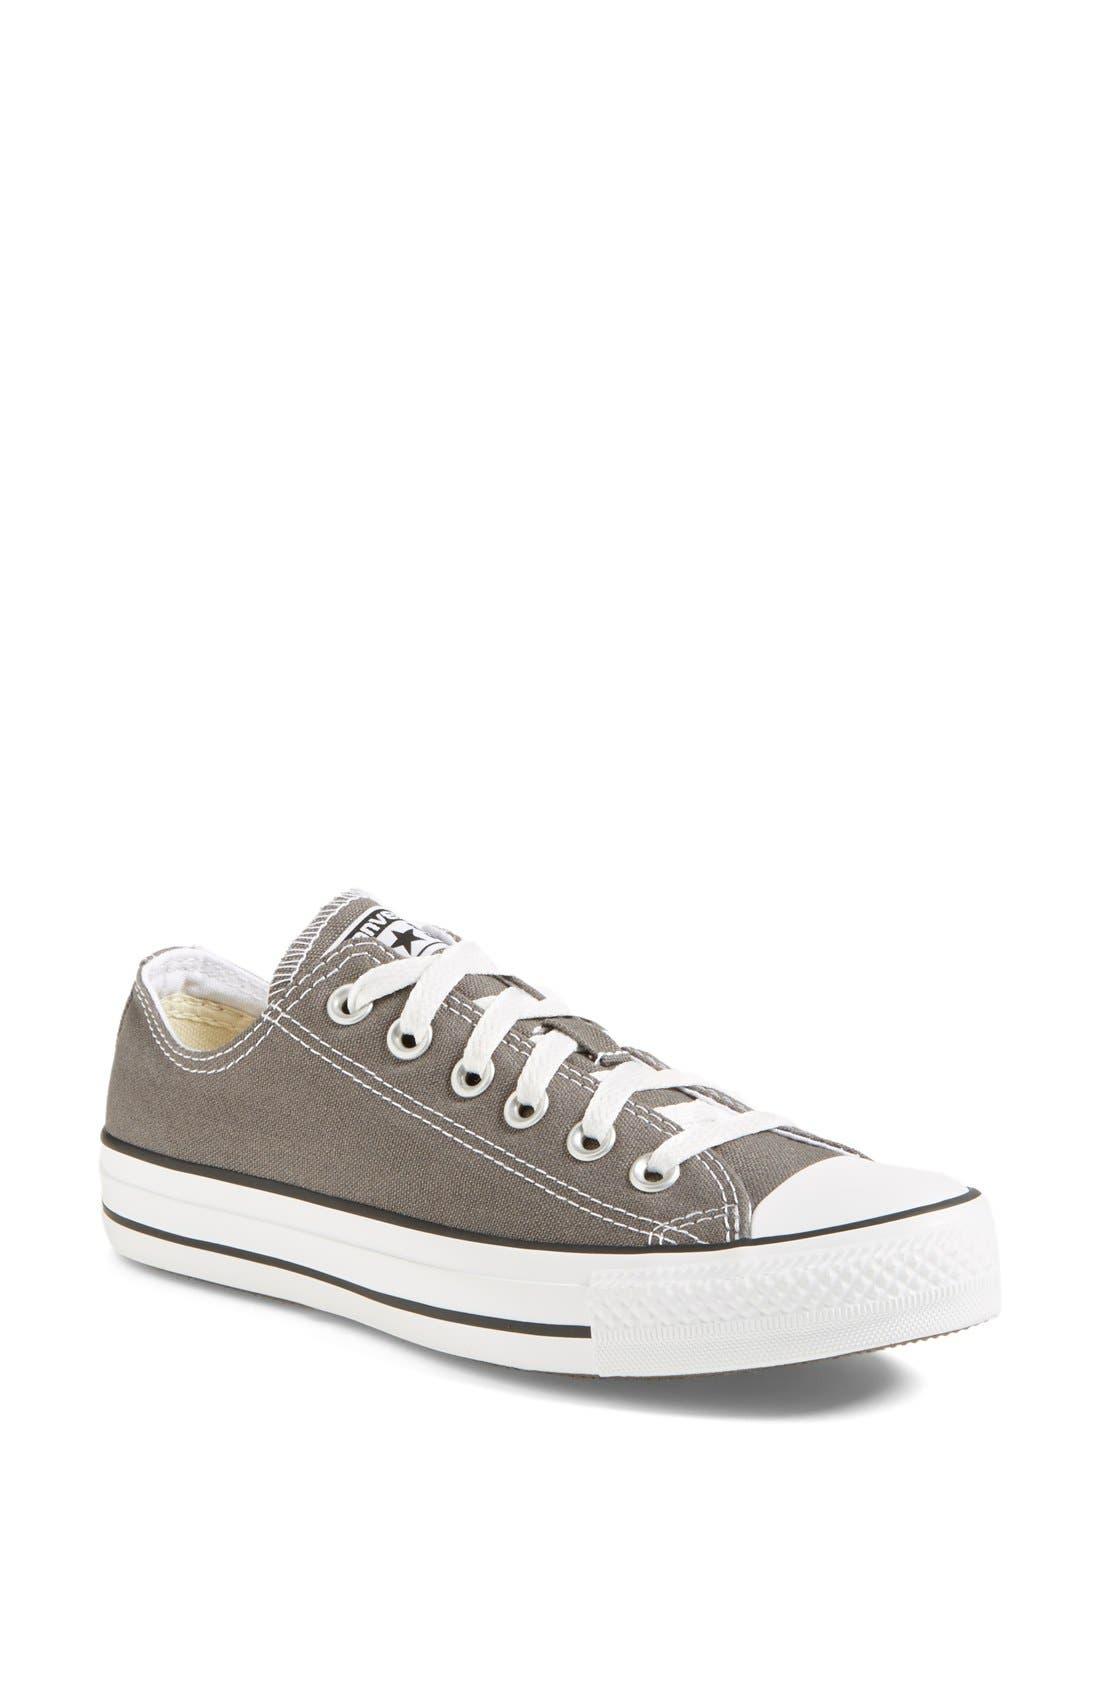 Alternate Image 1 Selected - Converse Chuck Taylor® Low Sneaker (Women)